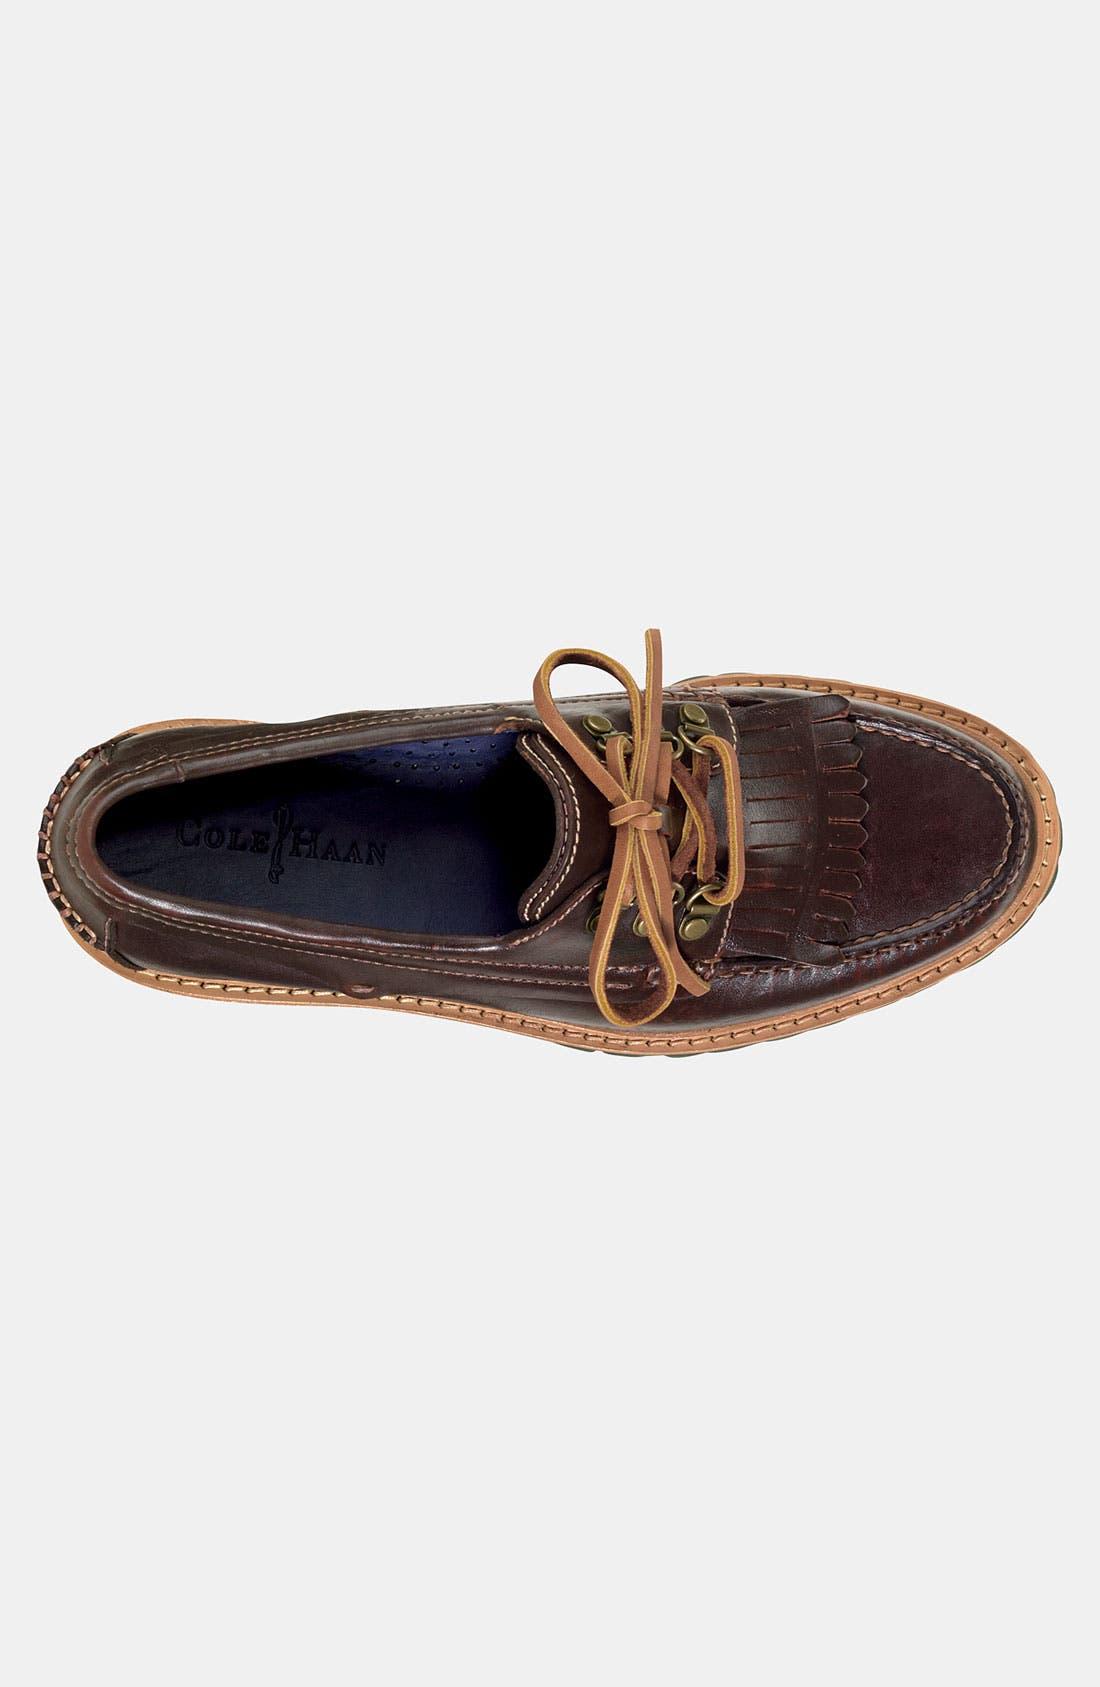 Alternate Image 3  - Cole Haan 'Monroe' Kiltie Boat Shoe   (Men)